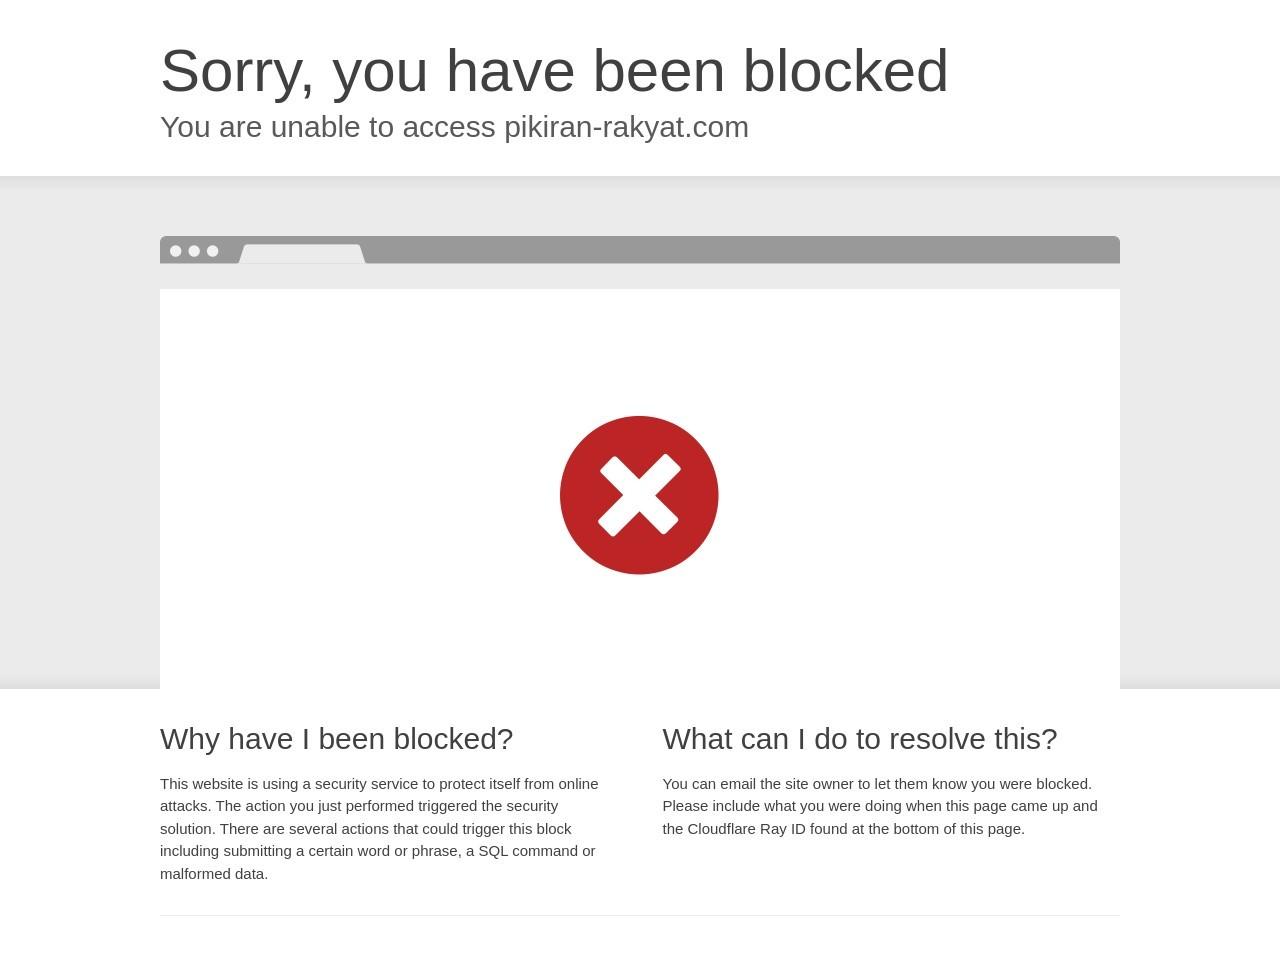 Vaksin Tuberkulosis Disebut Dapat Membantu Melindungi Tubuh Manusia dari COVID-19 - Kabar Besuki